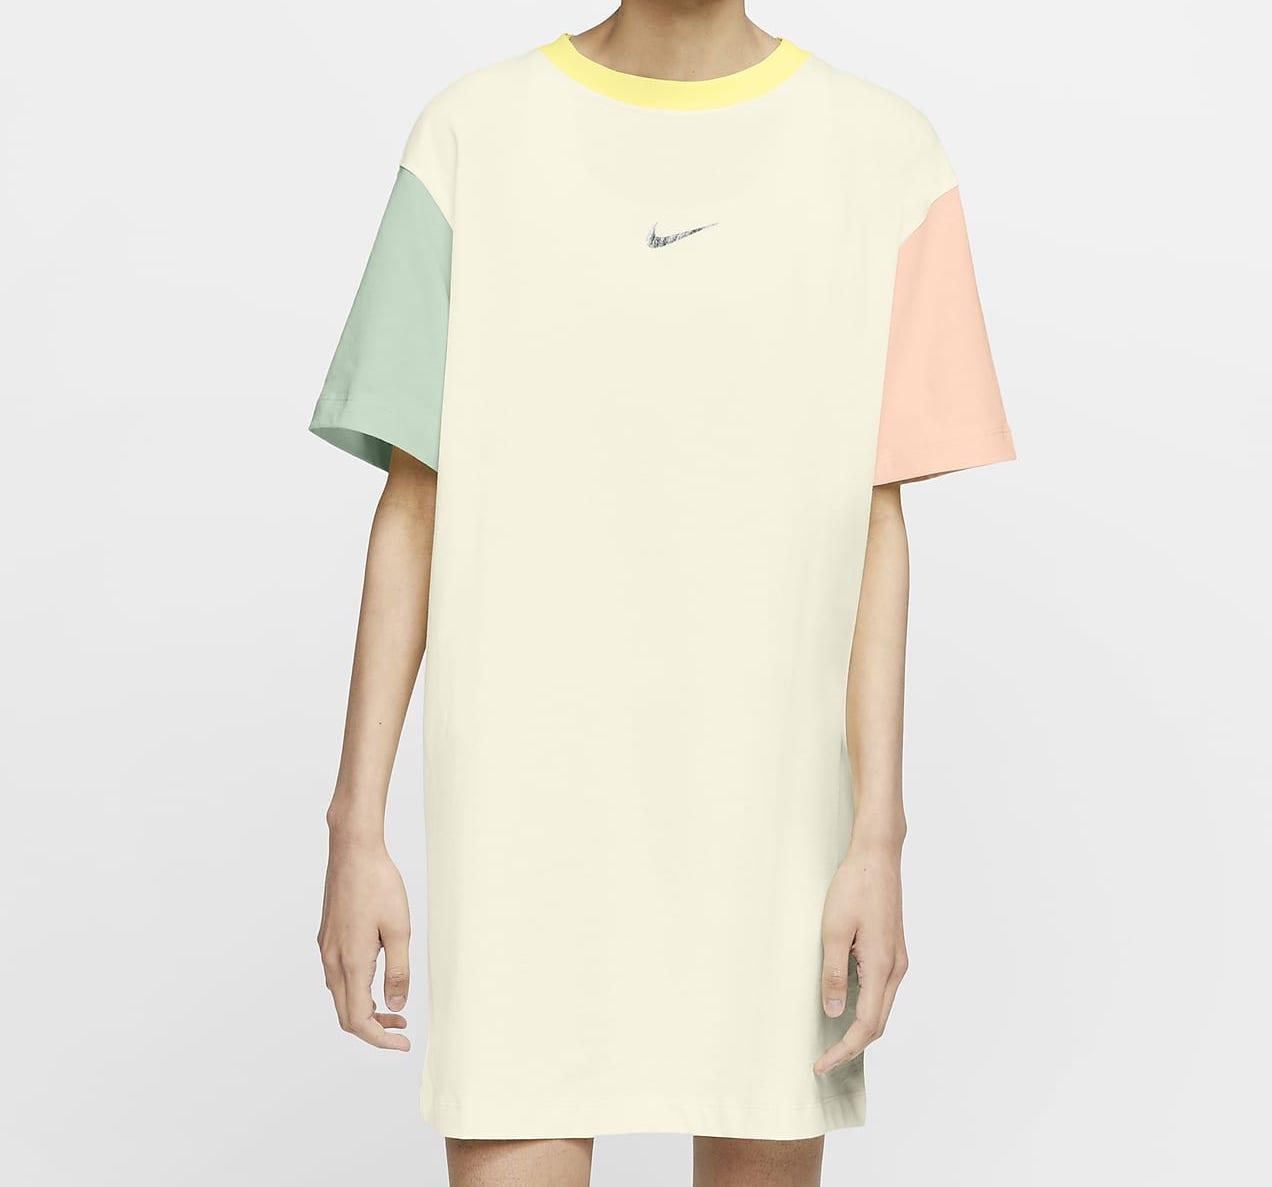 Nike Sportswear Swoosh T-Shirt Multi Pastel